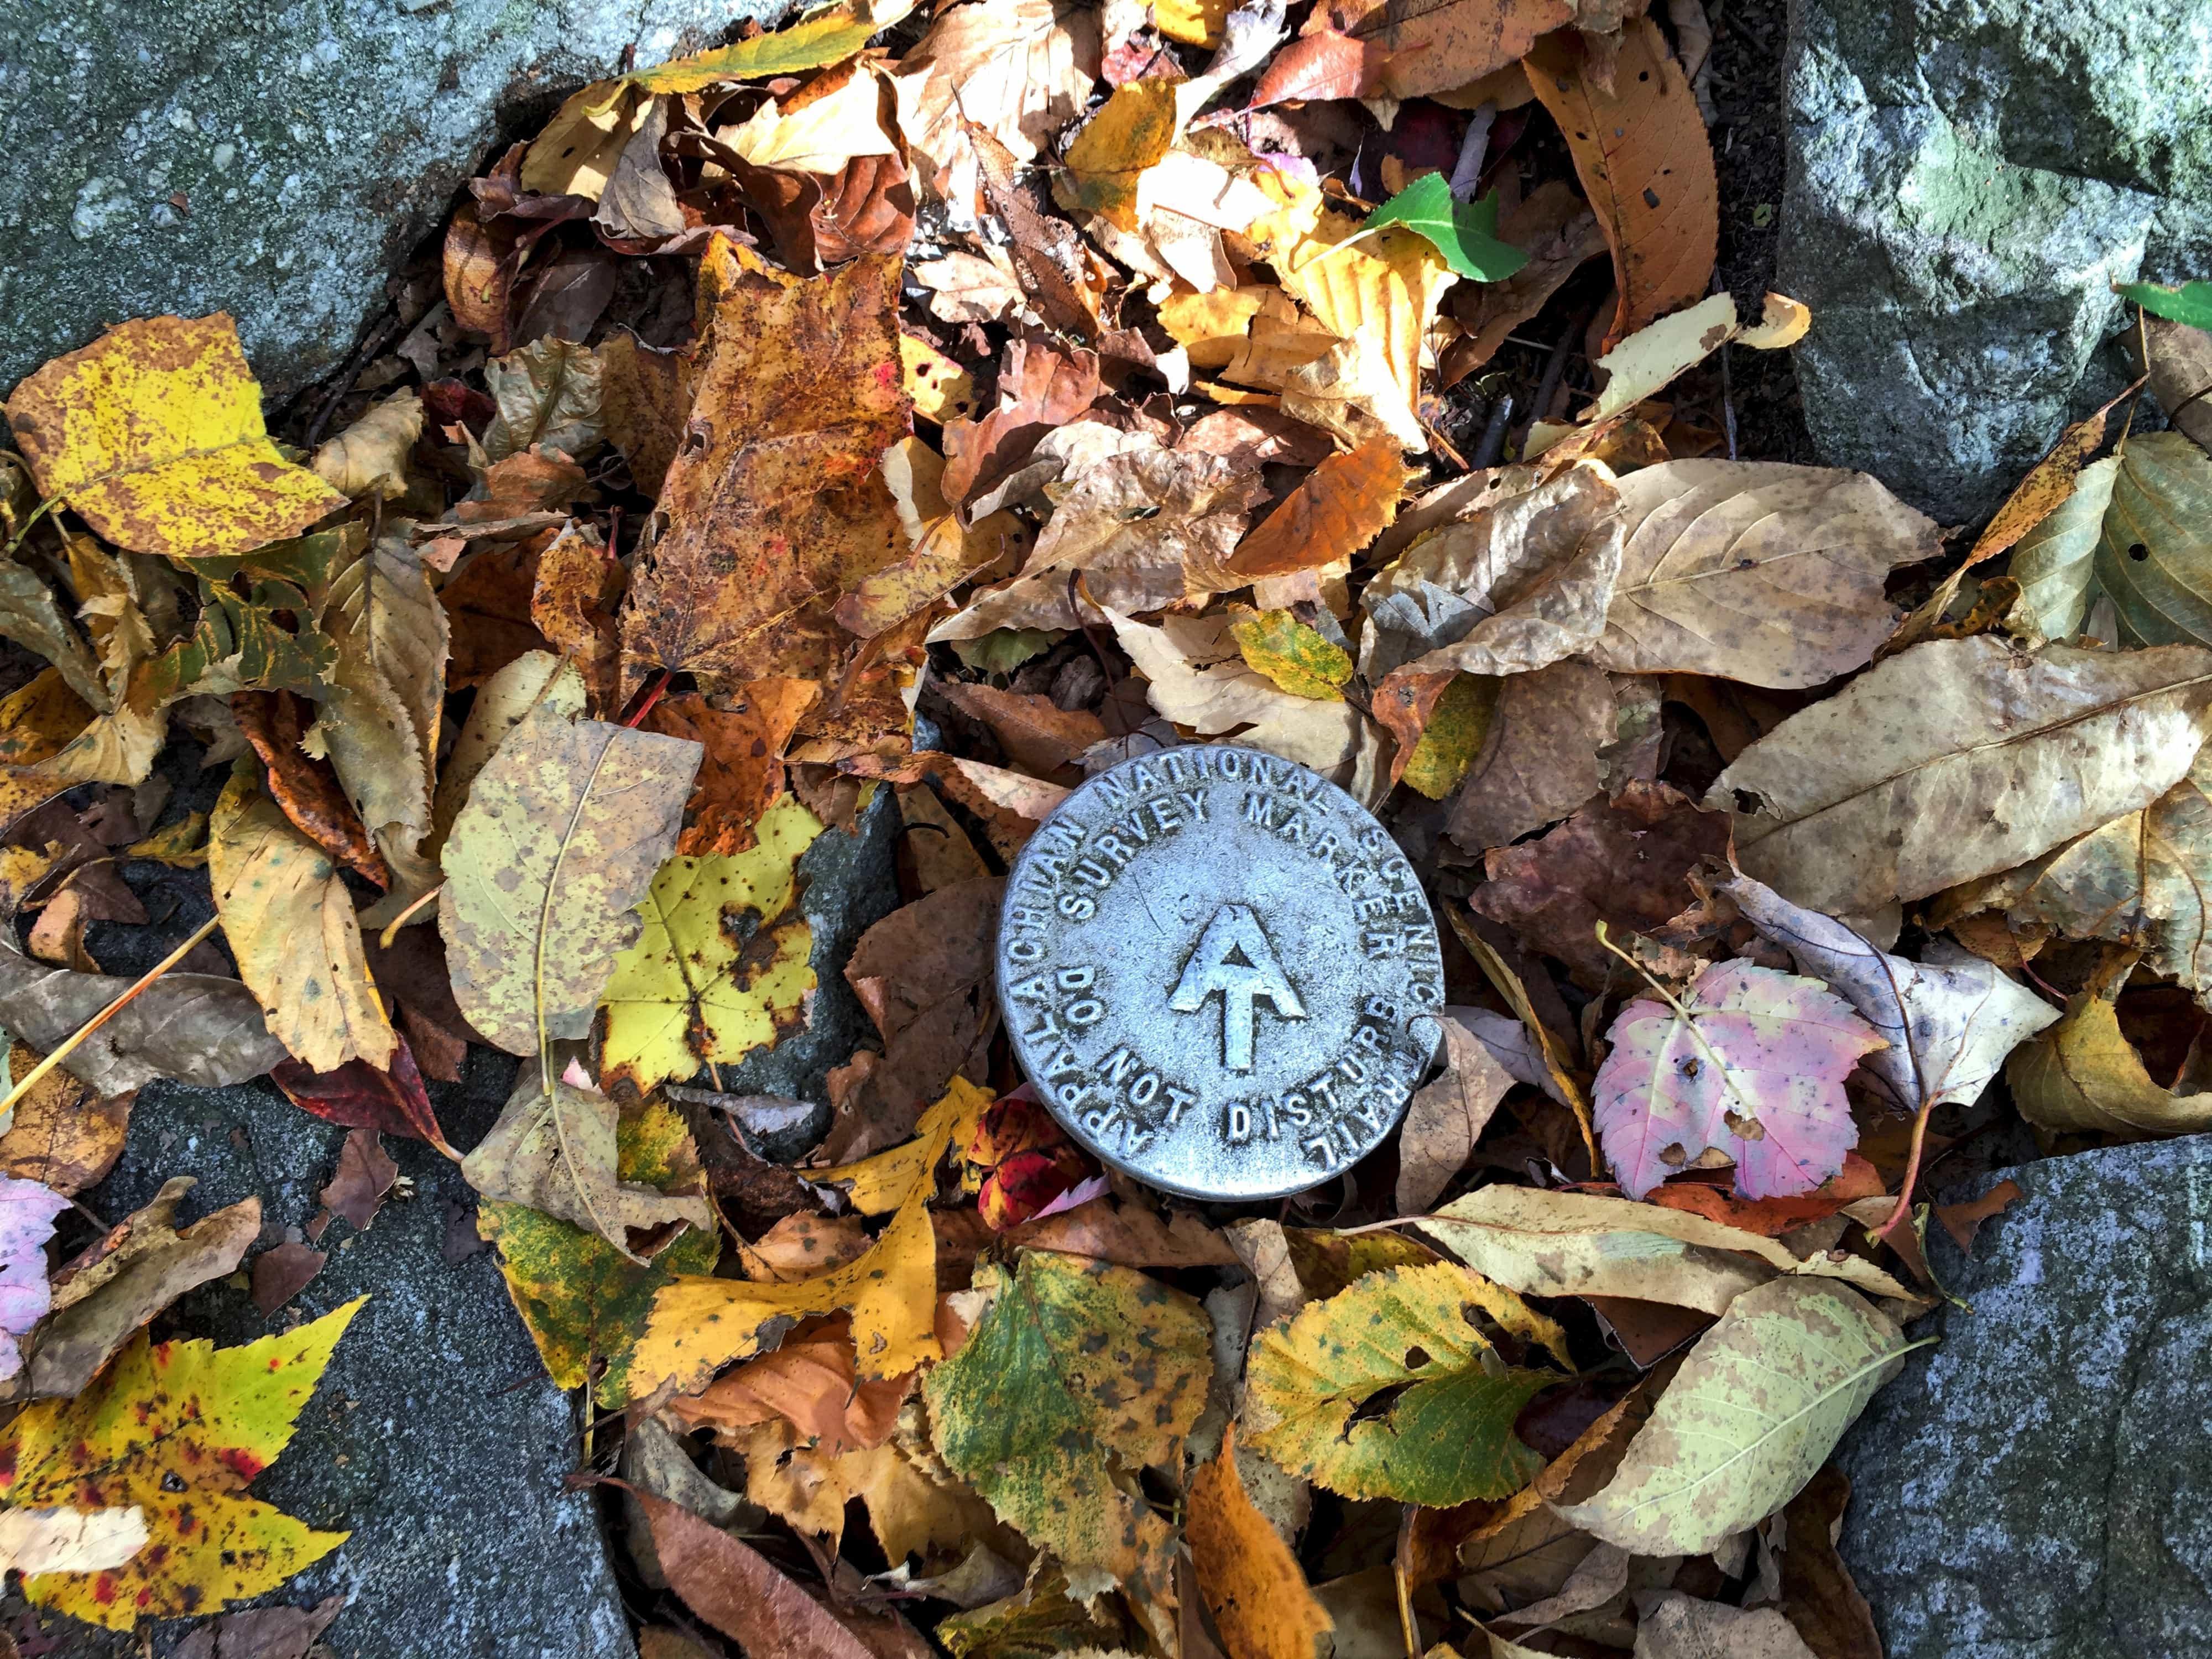 Appalachian Trail marker (photo: Steve Raubenstine)